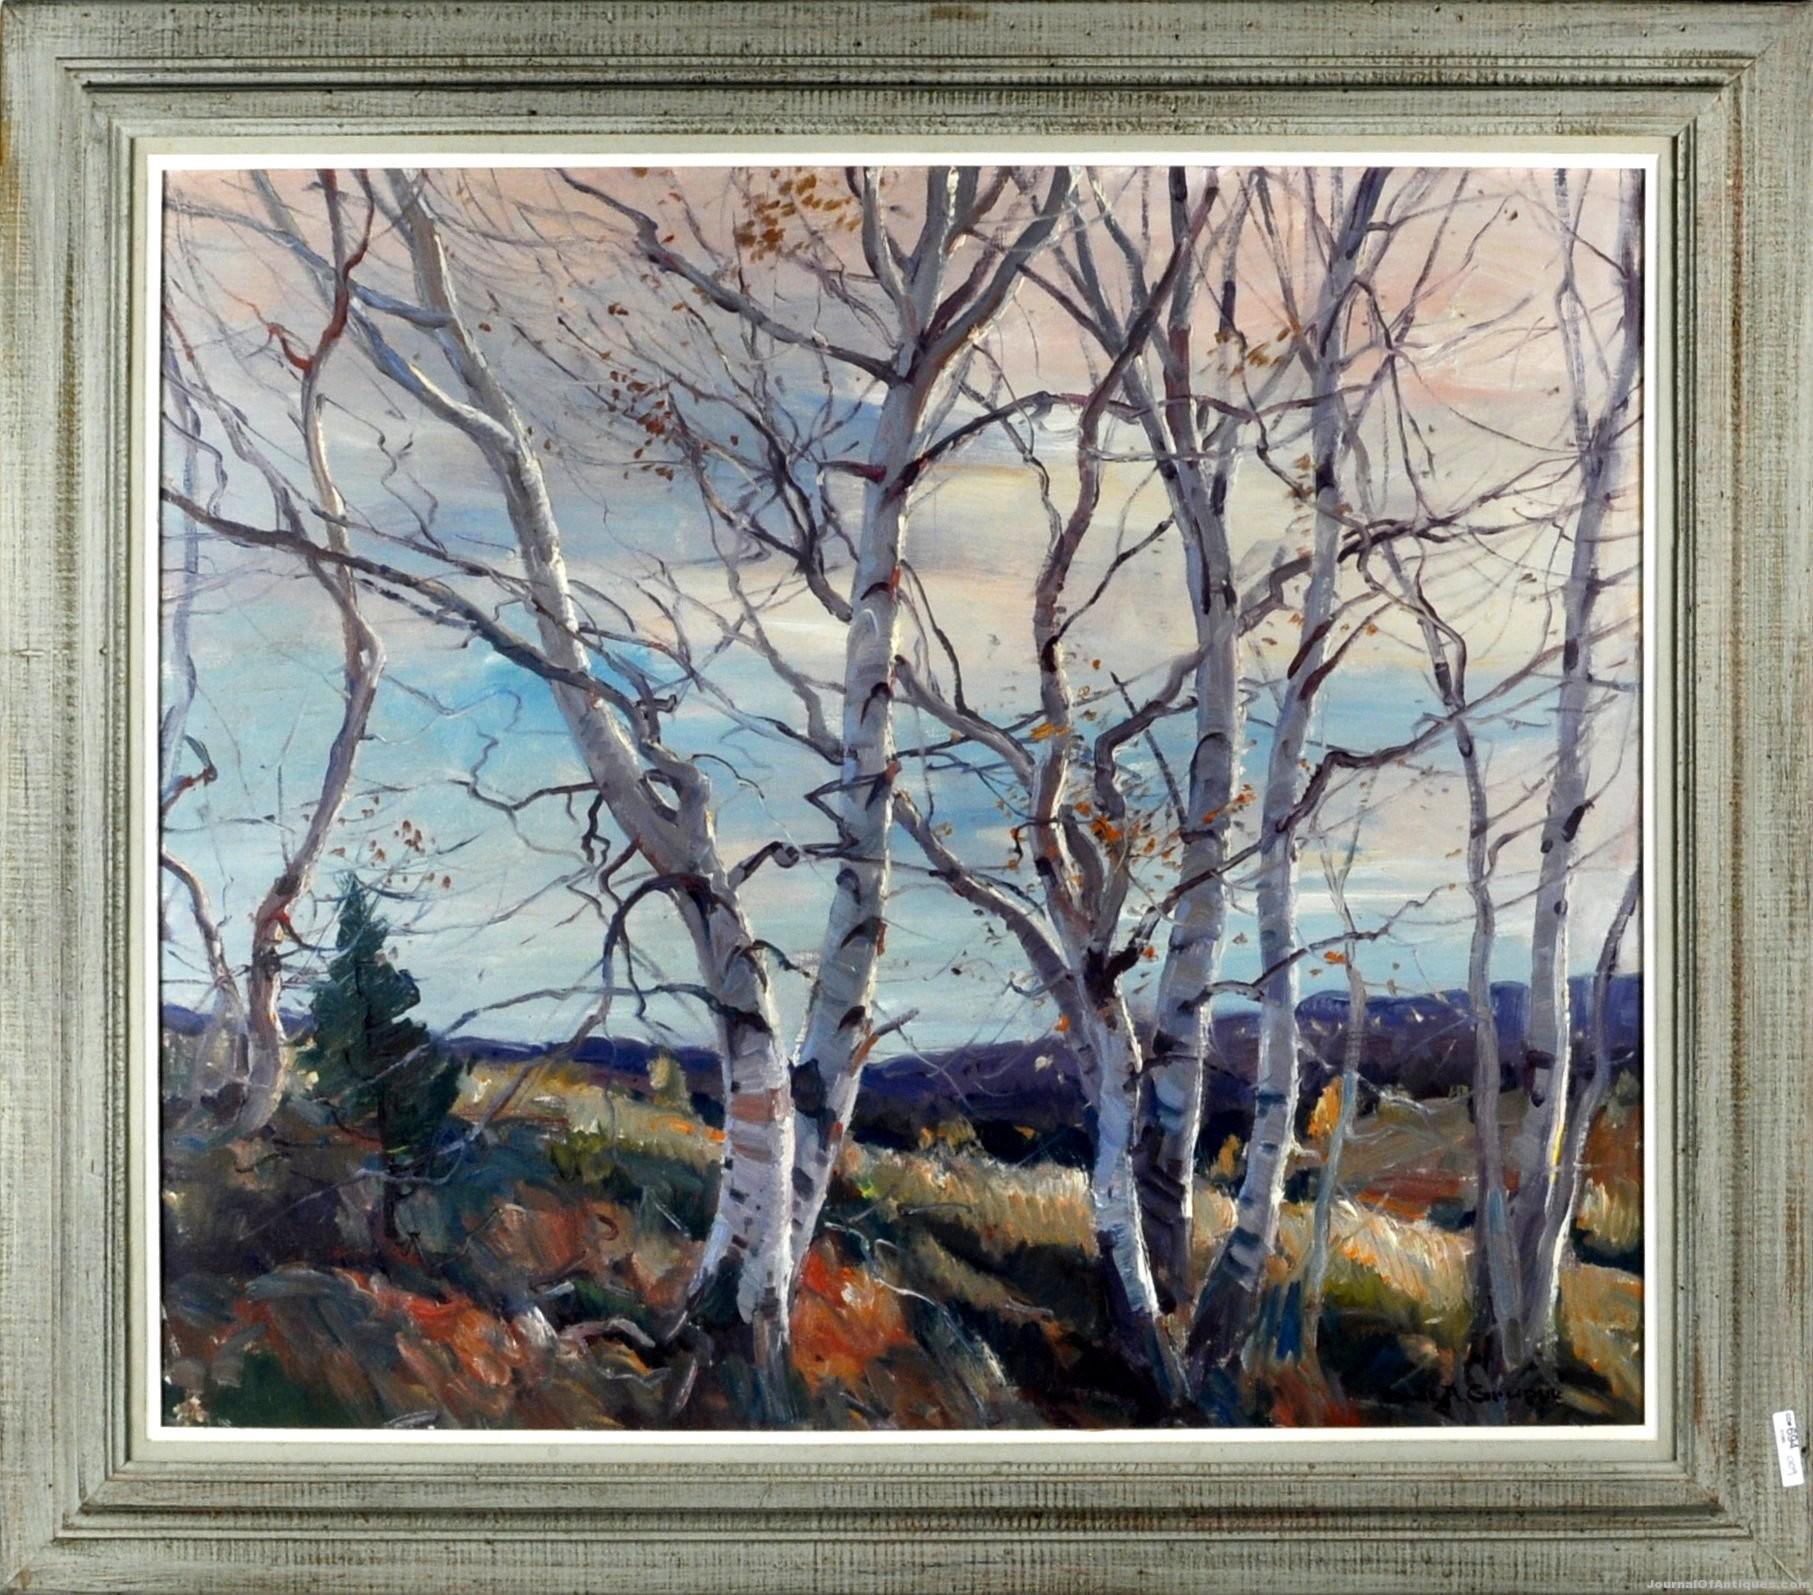 Two Emile Gruppe artworks, $21,000, Woodbury Auction